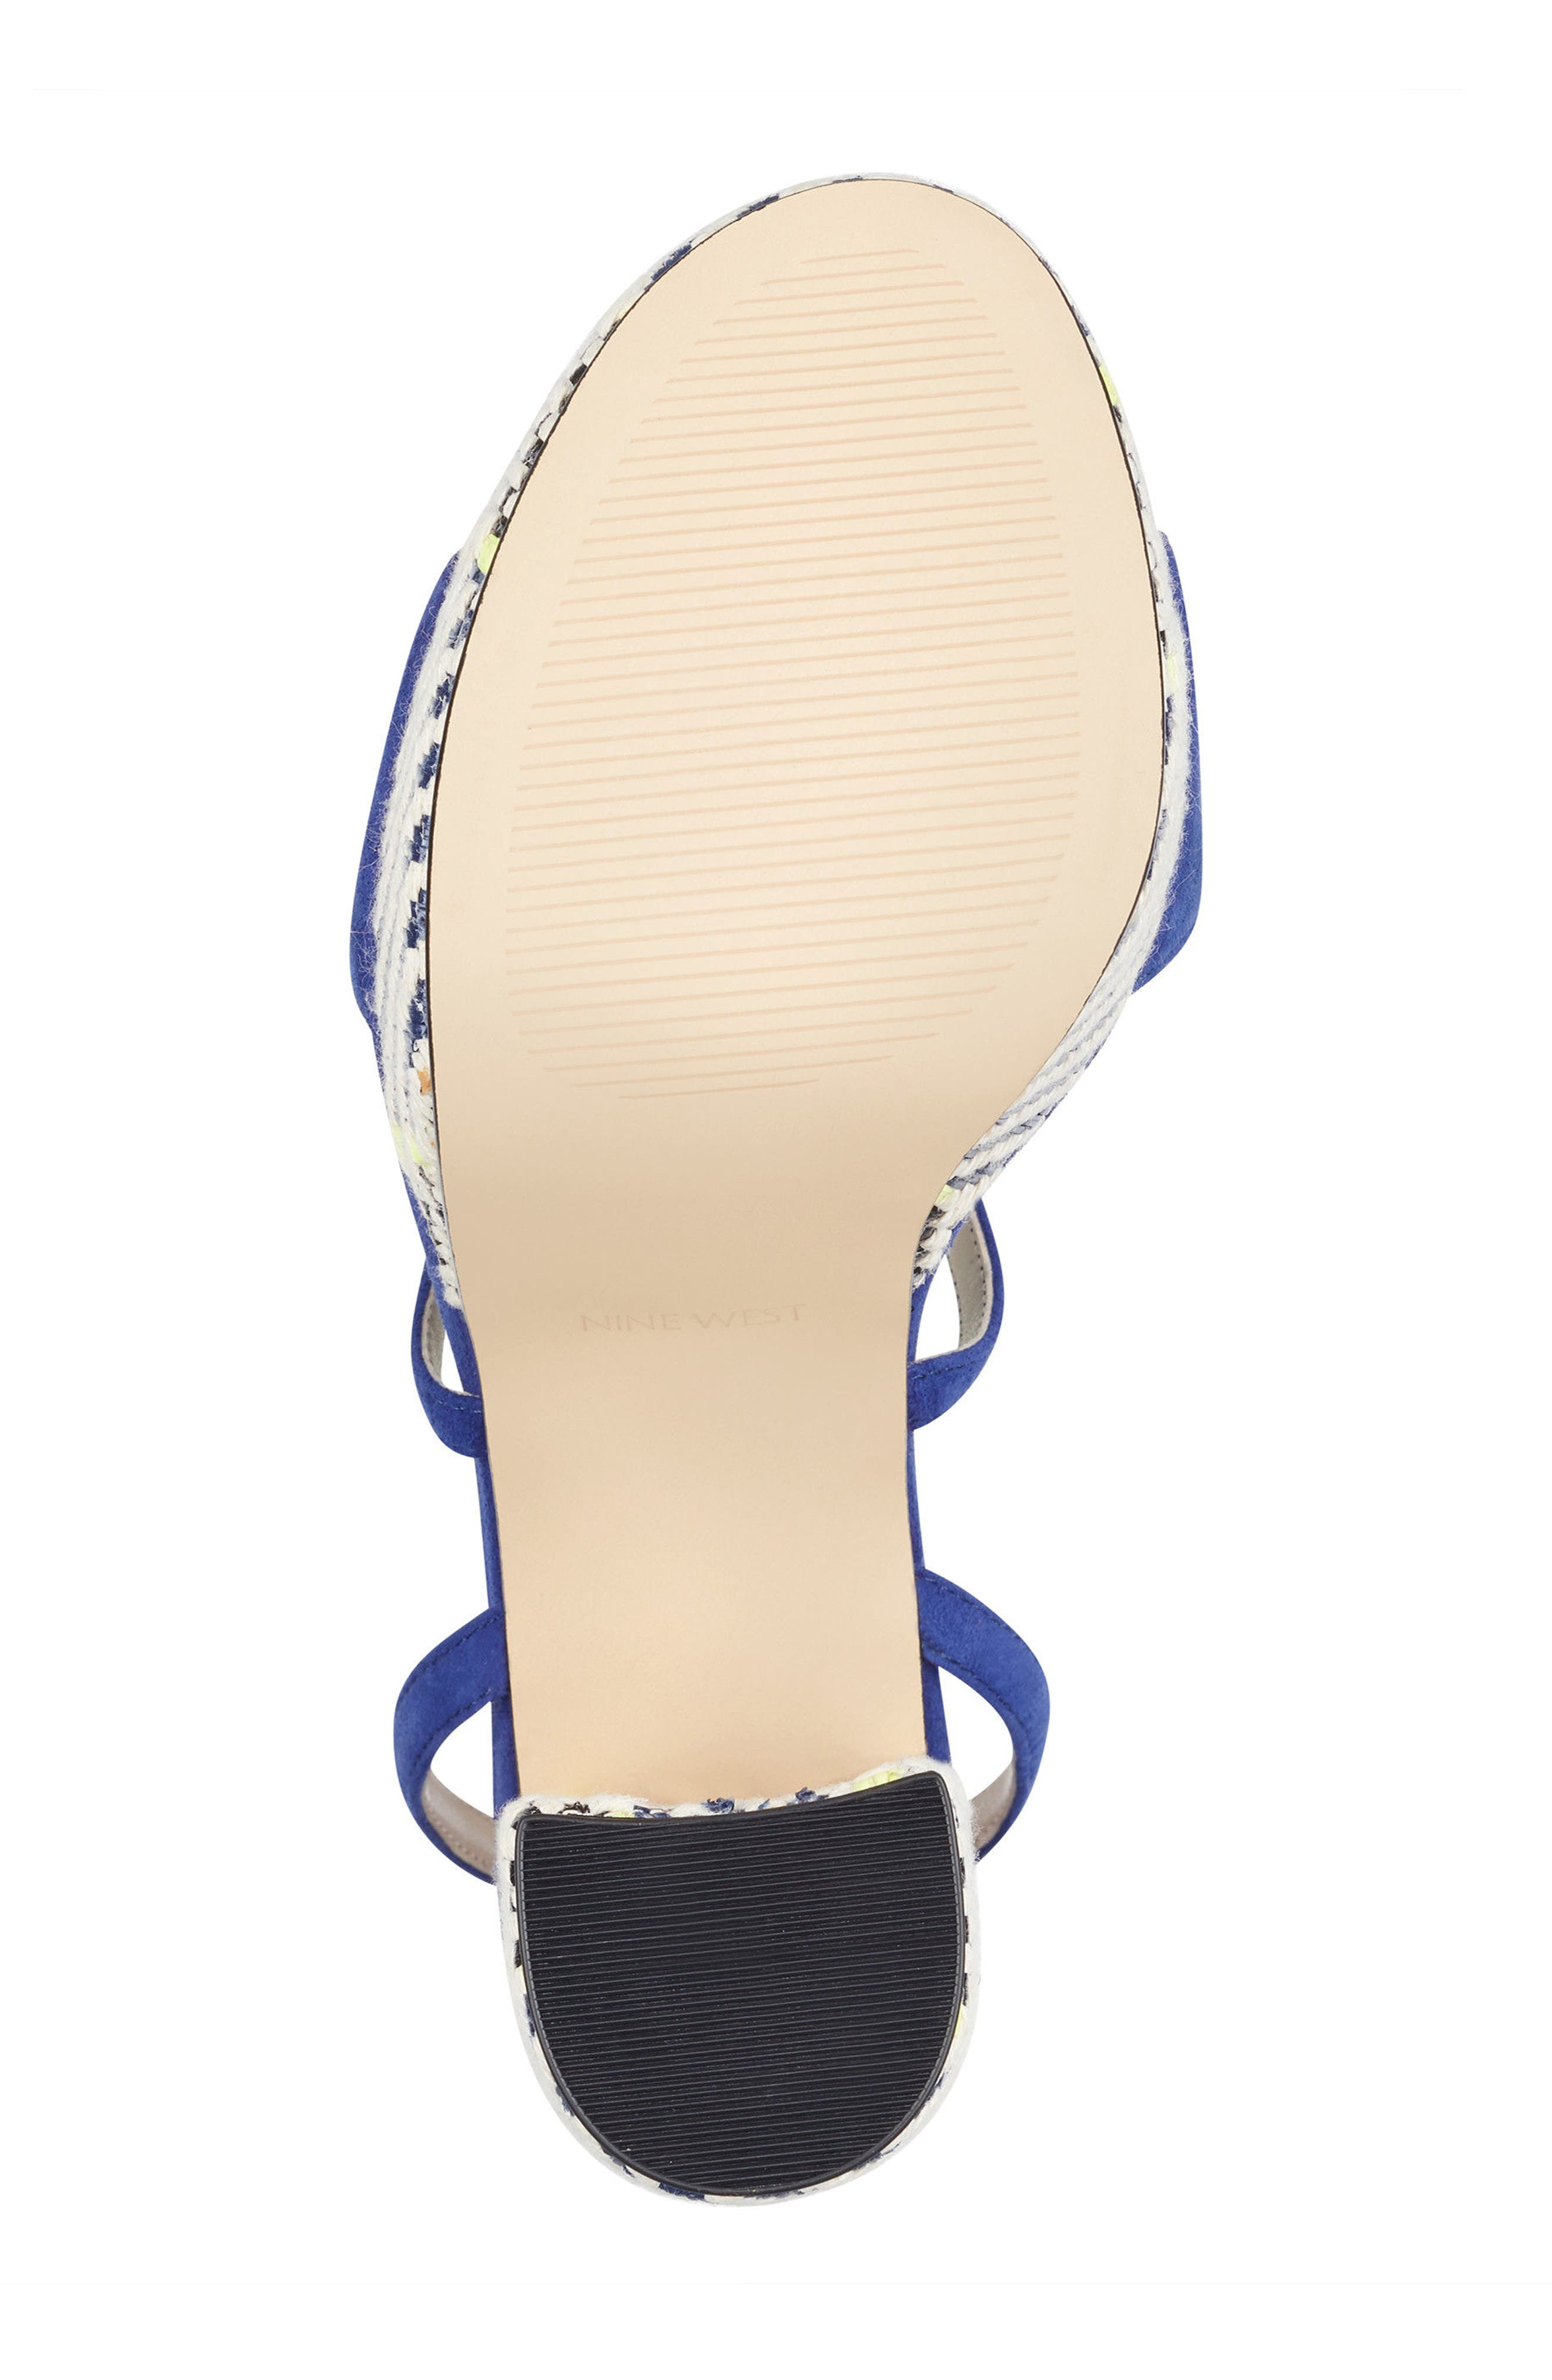 Markando Platform Sandal,                             Alternate thumbnail 6, color,                             Dark Blue Suede